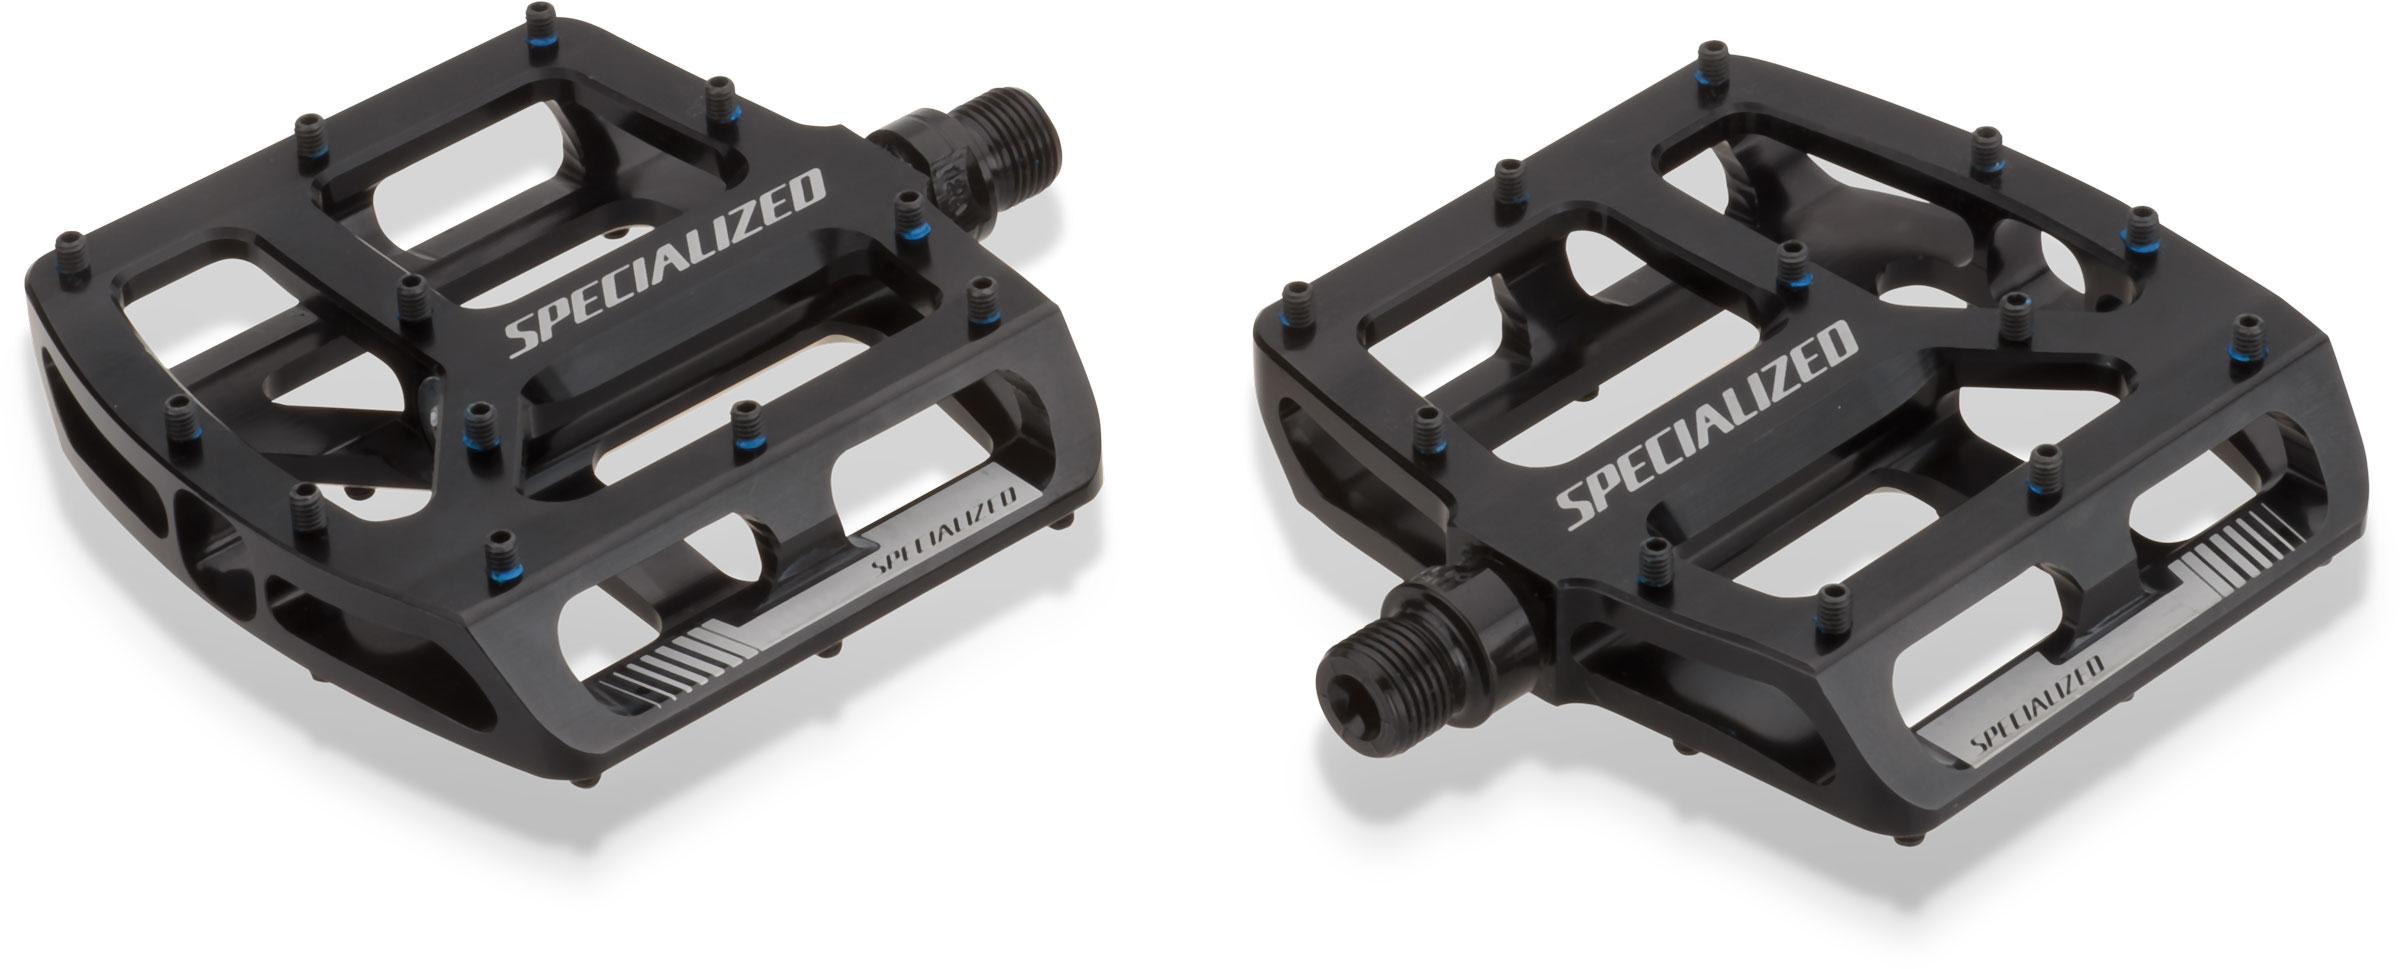 3b9628efdba Specialized Bennies Platform Pedals - ProCycing